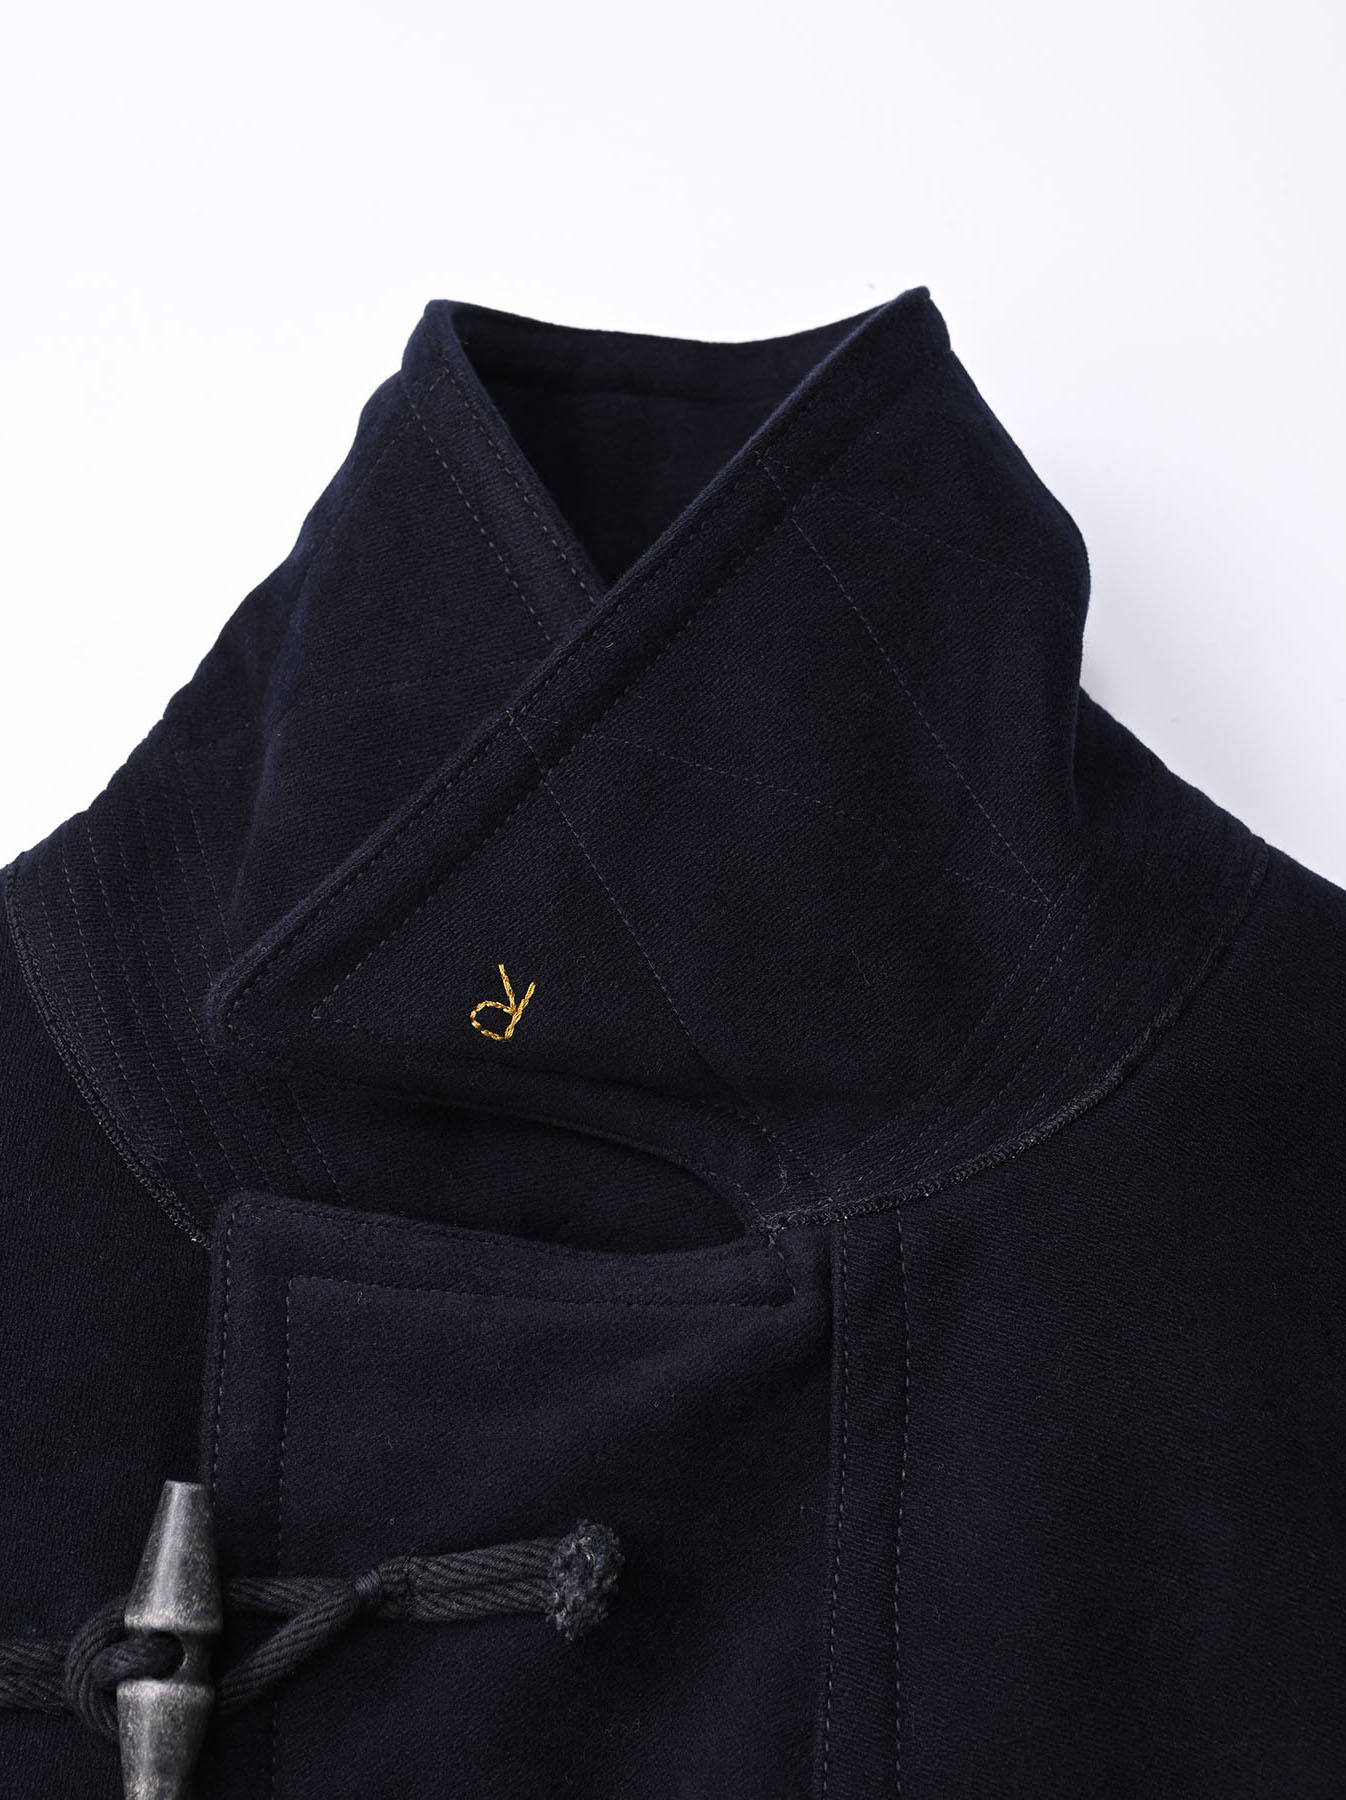 Thick Cotton Flannel Hayama Duffle Coat-5